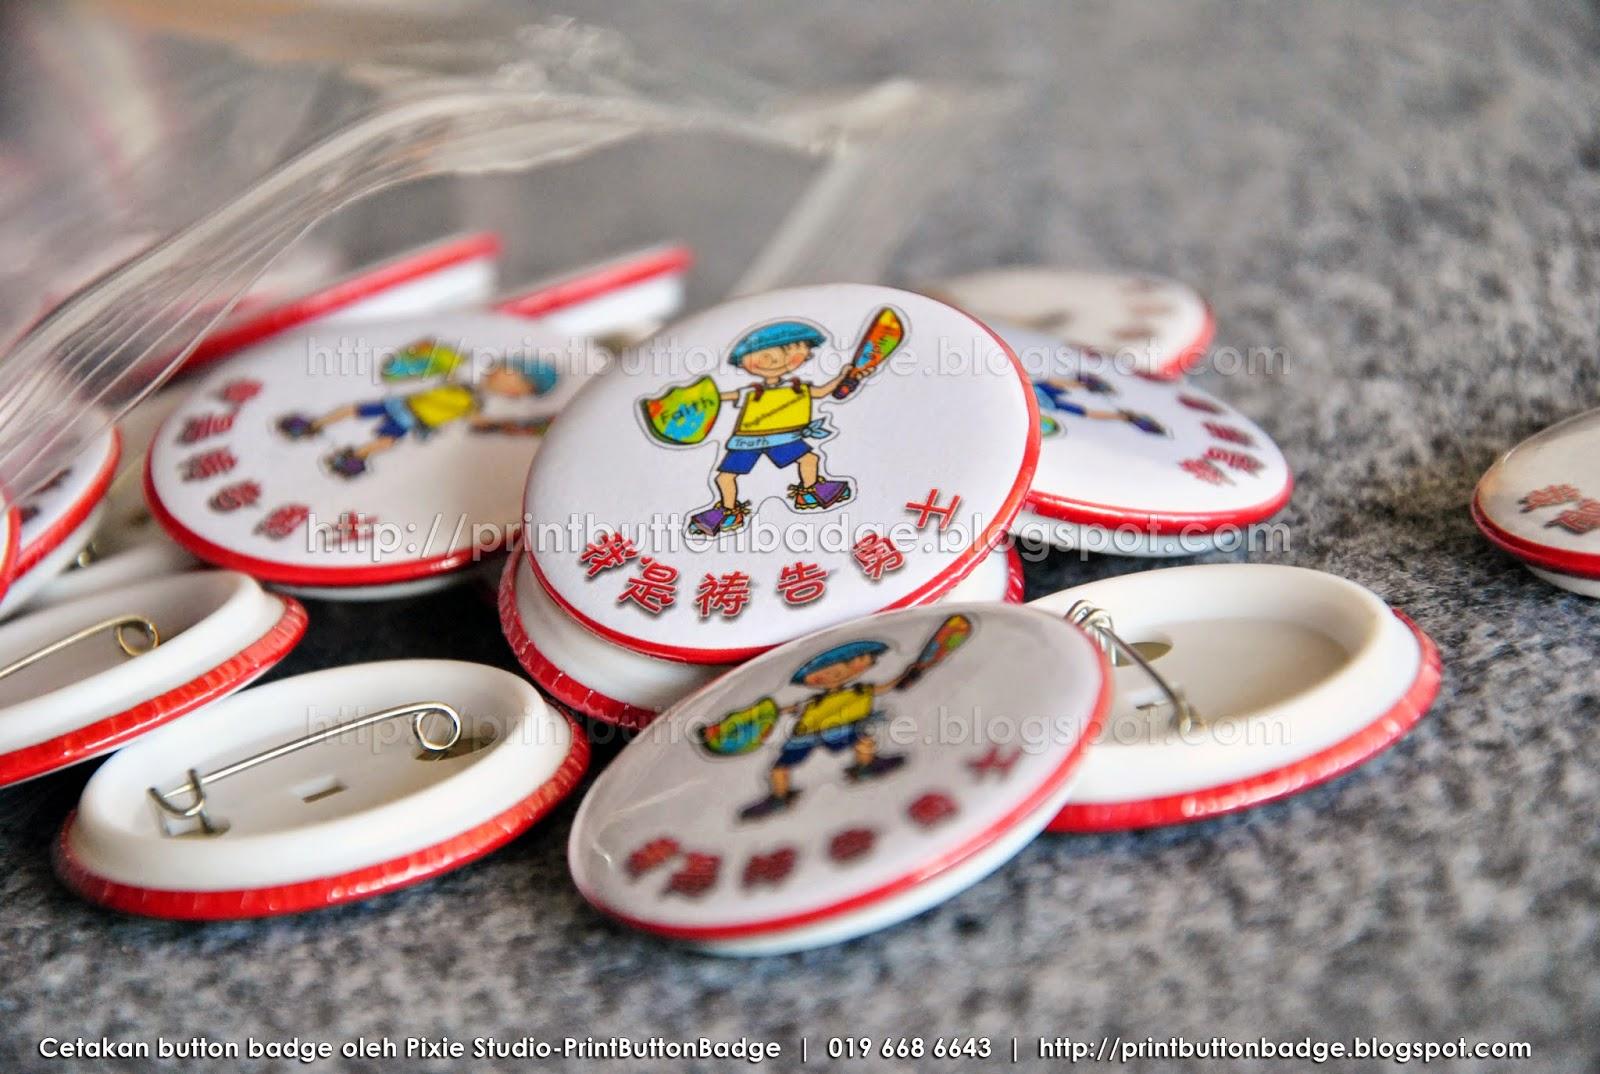 tempahan online button badge